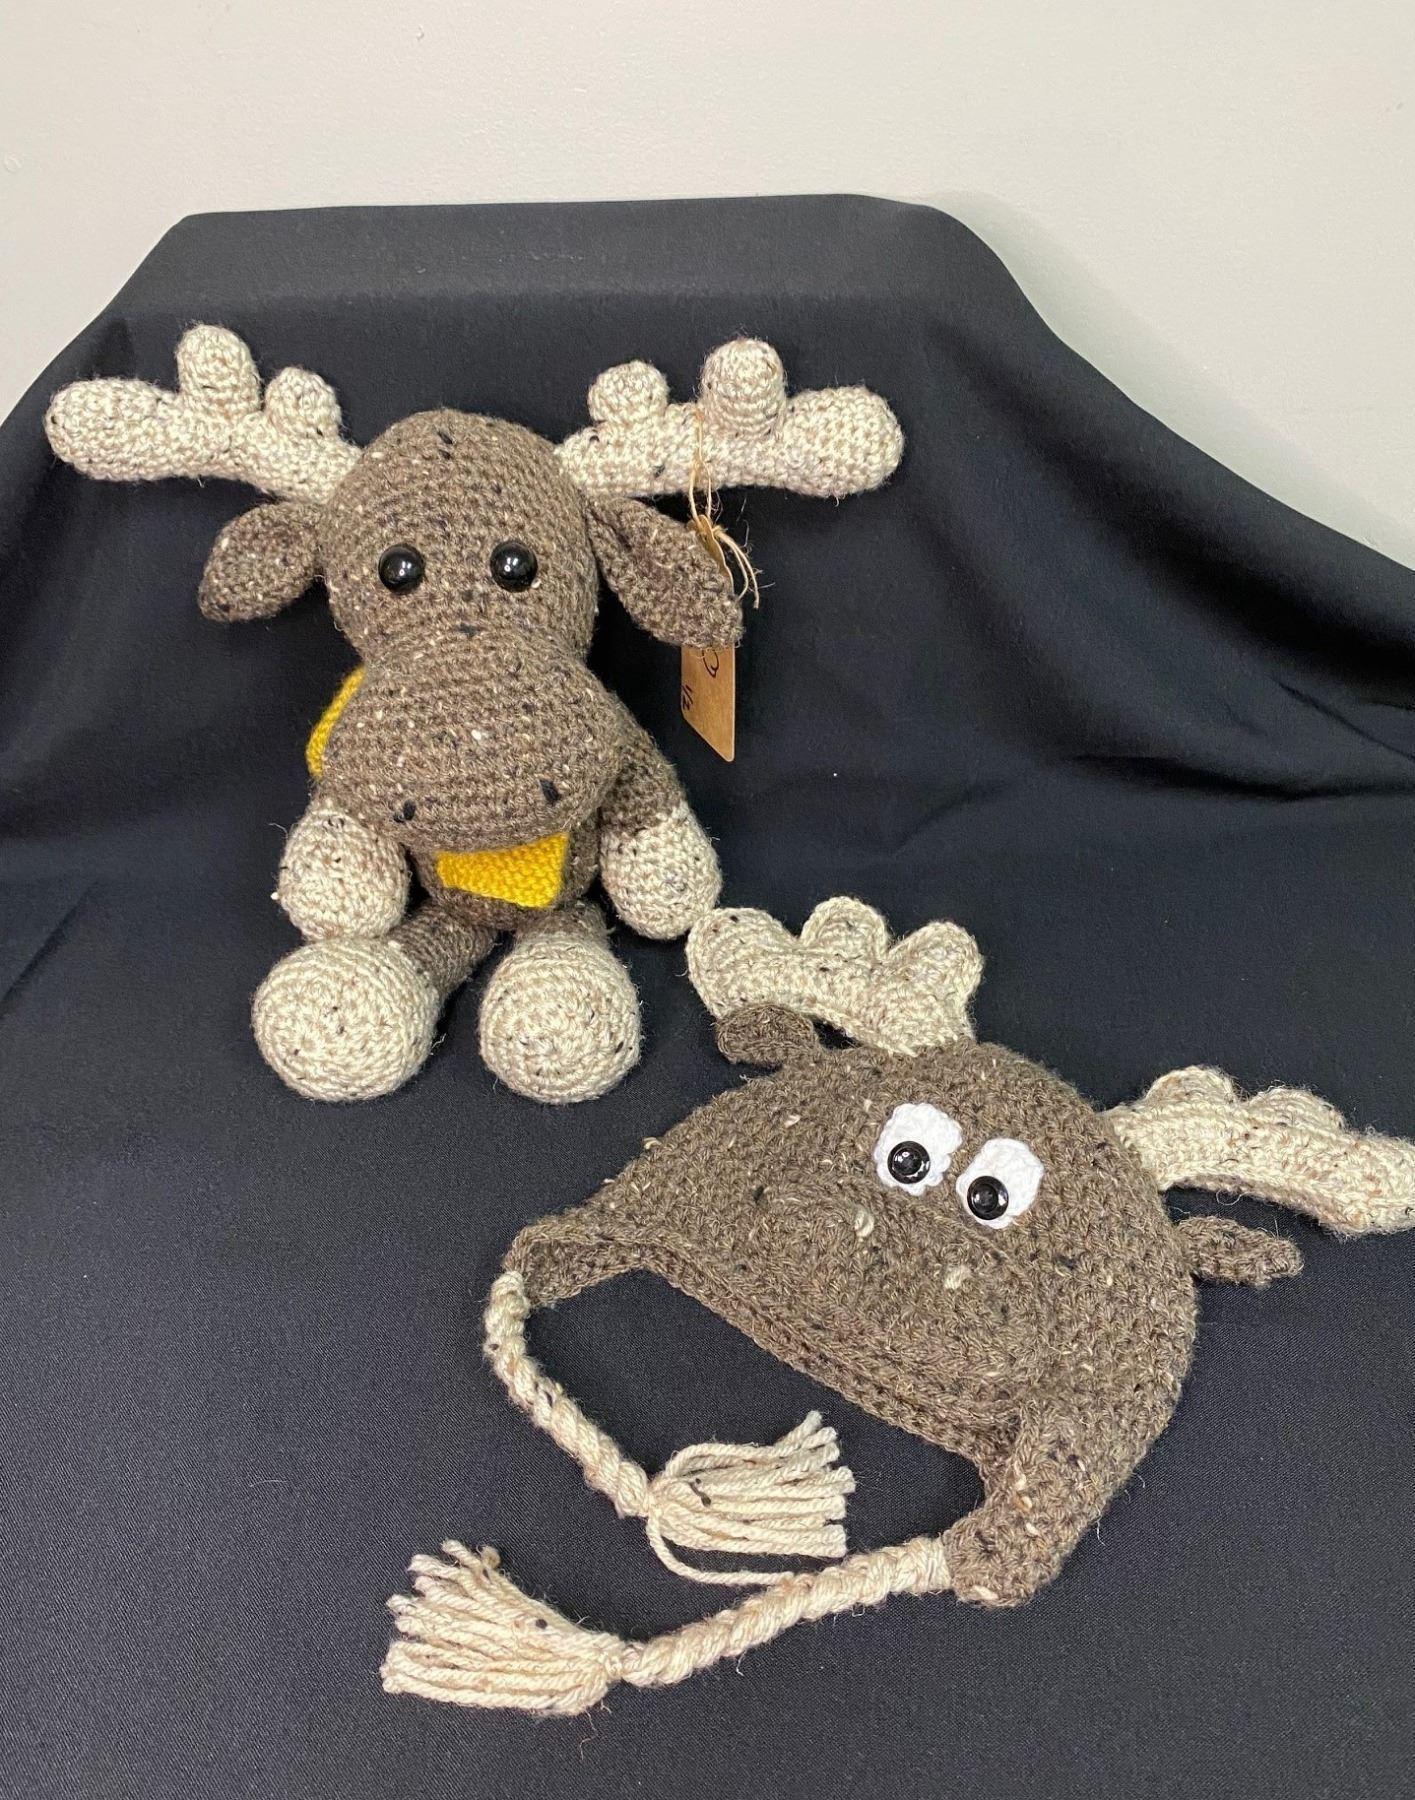 Marty the Moose Stuffed Animal & Hat